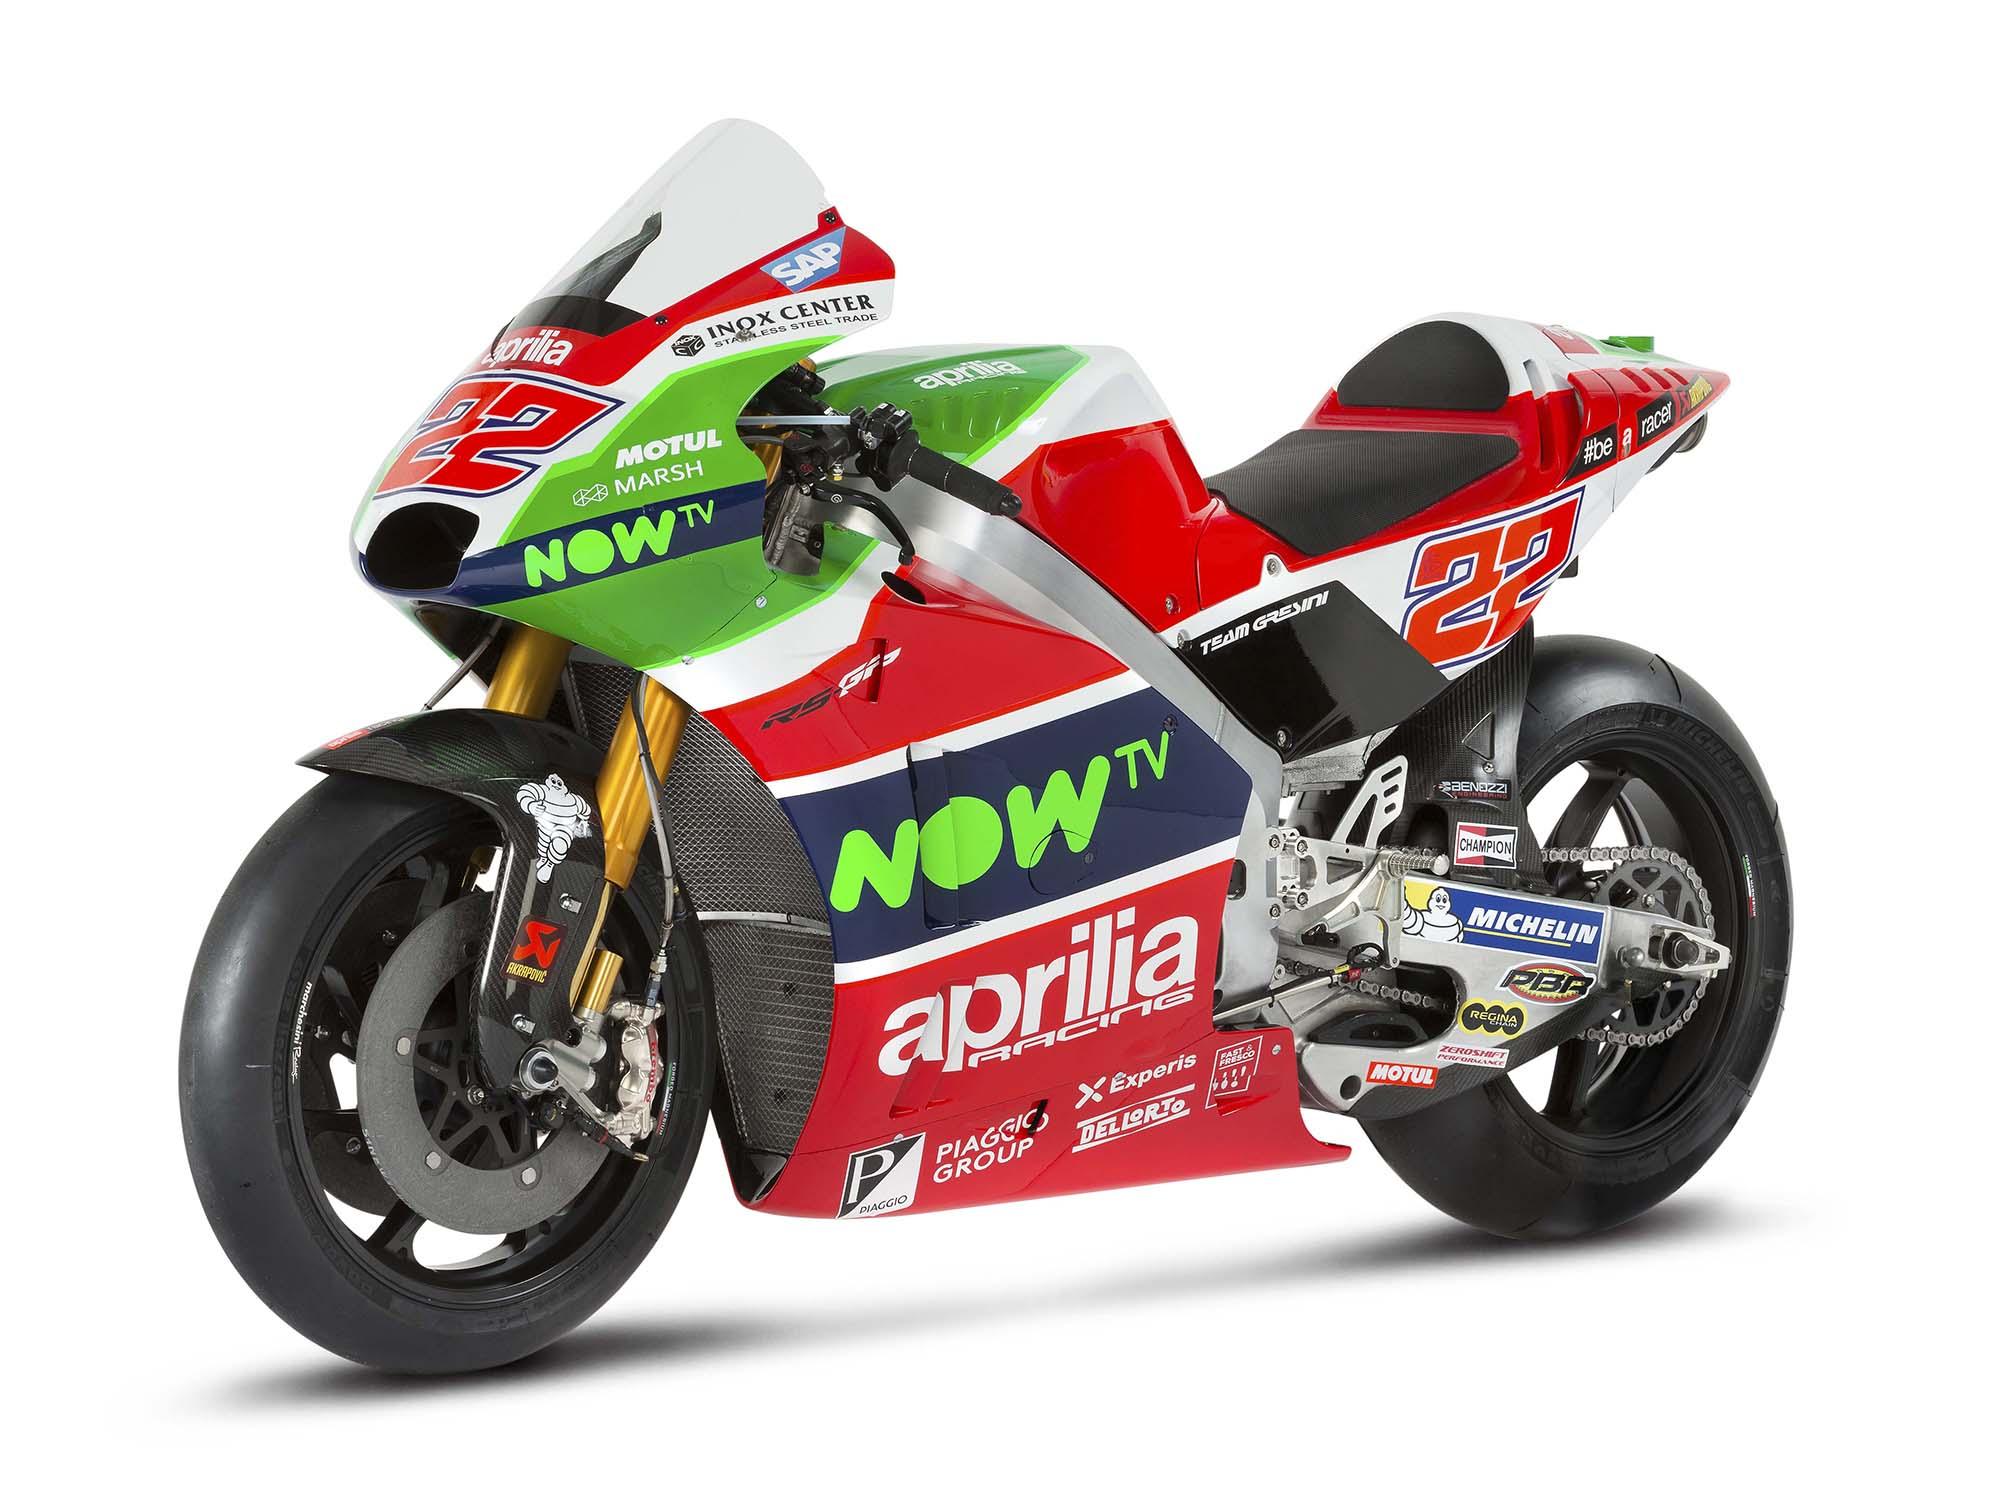 MotoGP: Aprilia Unveals the RS-GP Bike Livery for 2017 season - BikesRepublic